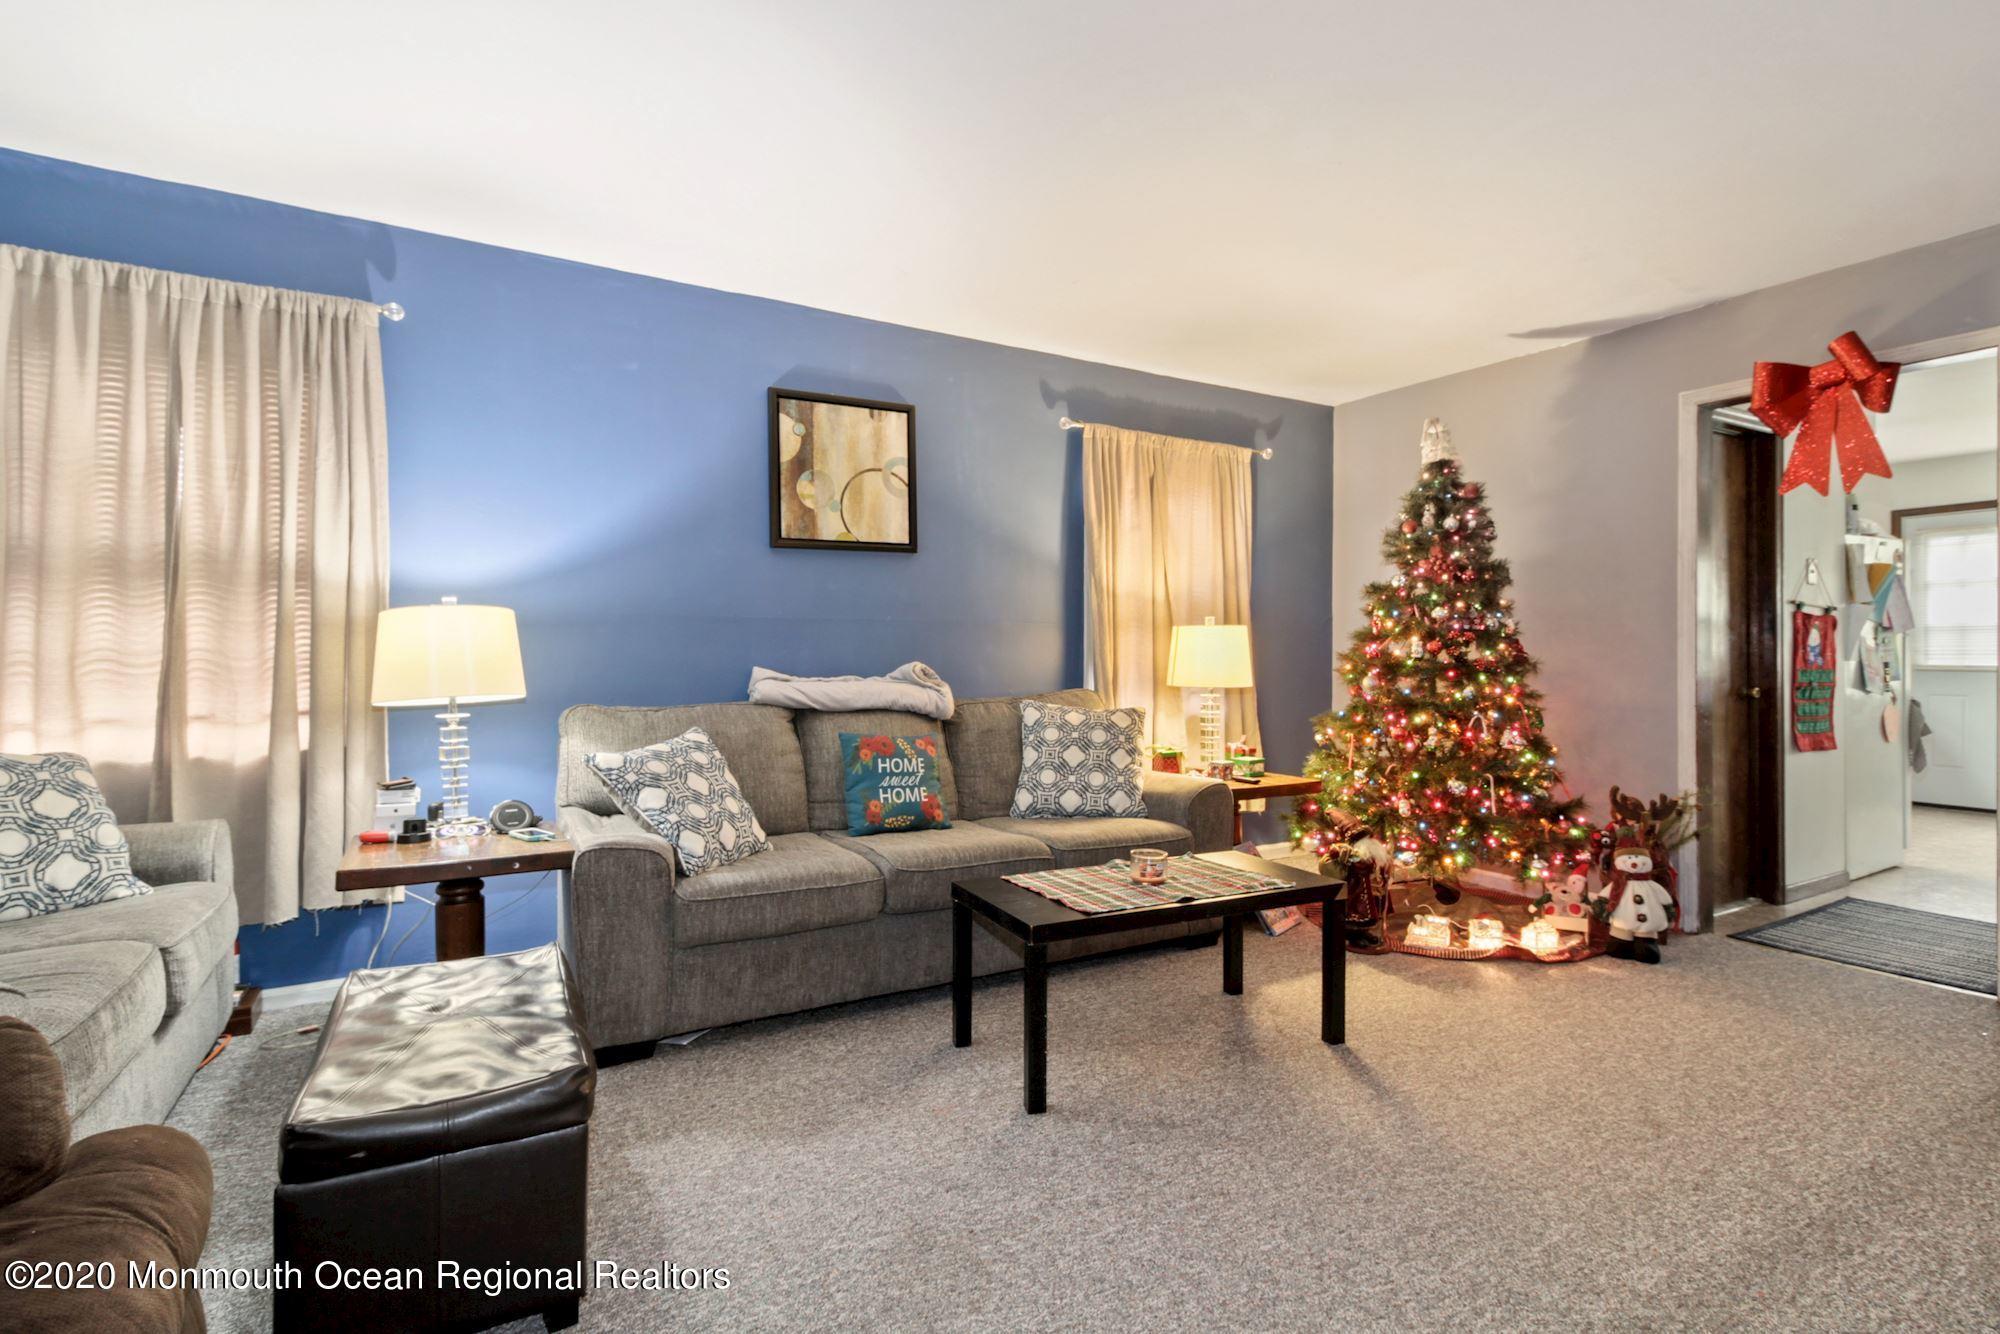 624 Mistletoe Avenue, Point Pleasant, New Jersey 08742, 4 Bedrooms Bedrooms, ,4 BathroomsBathrooms,Multifamily,For Sale,624 Mistletoe Avenue,2,22042363